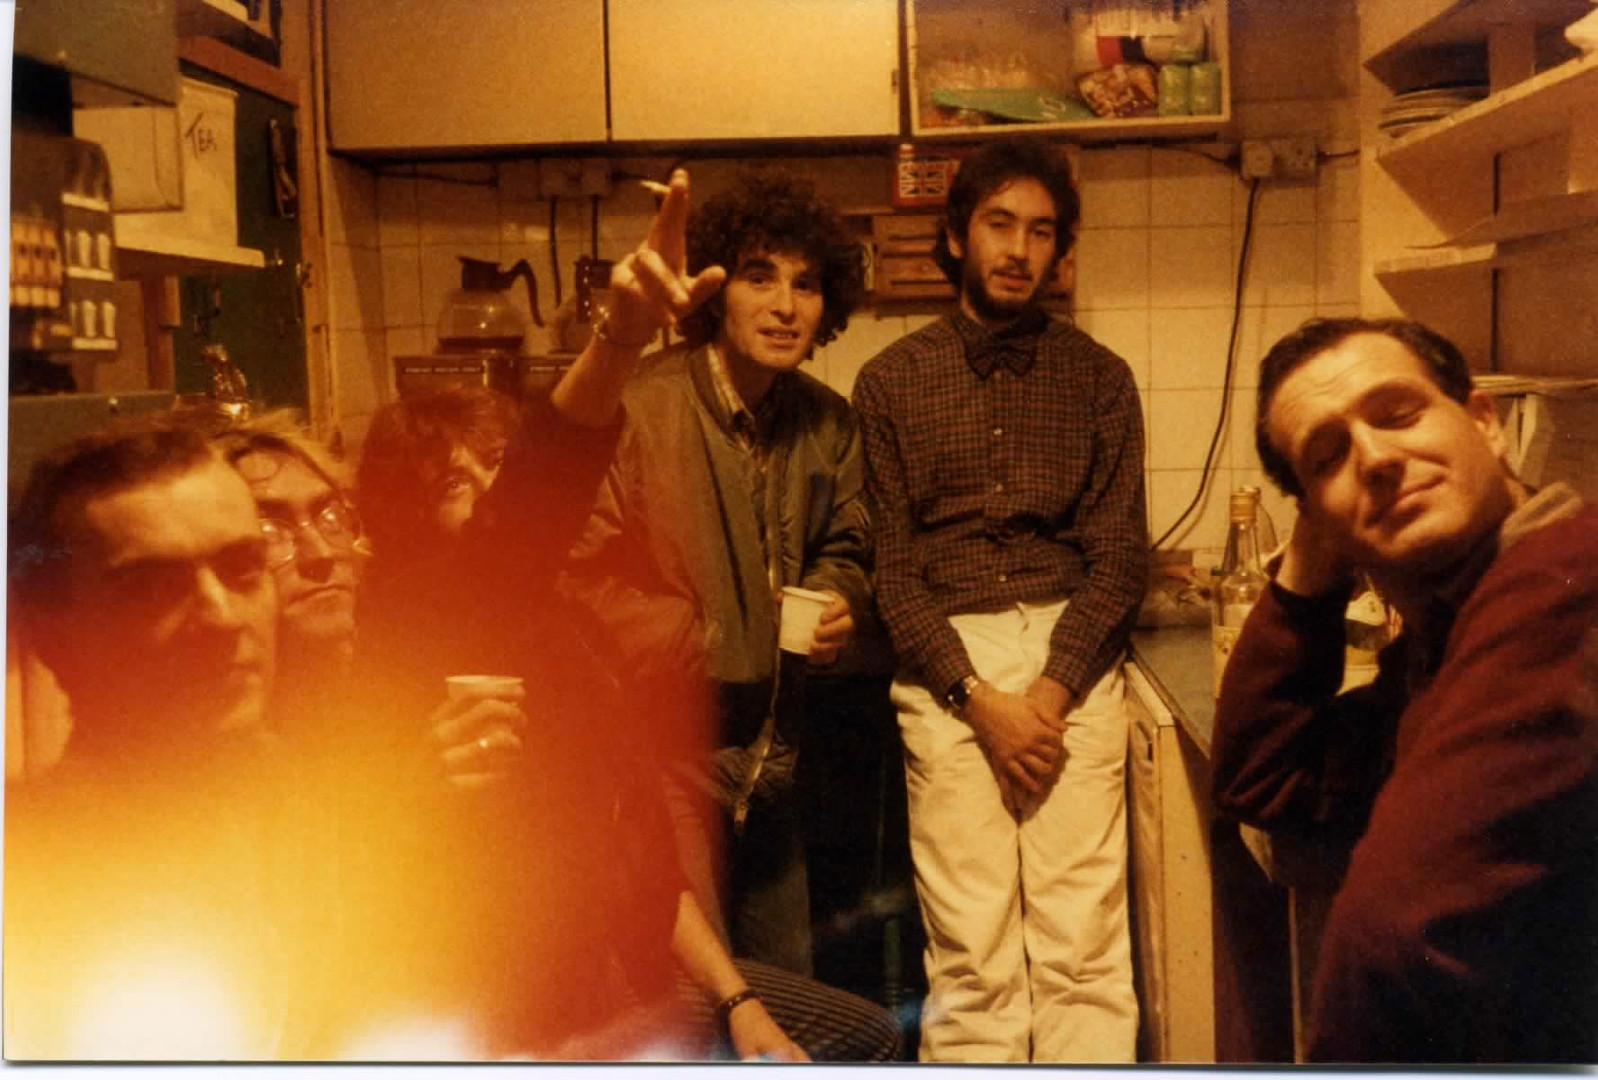 Richard Napper, Terry Abernethy, ?, Stan Siegal, Georges Meisner, Geoff Andrew.